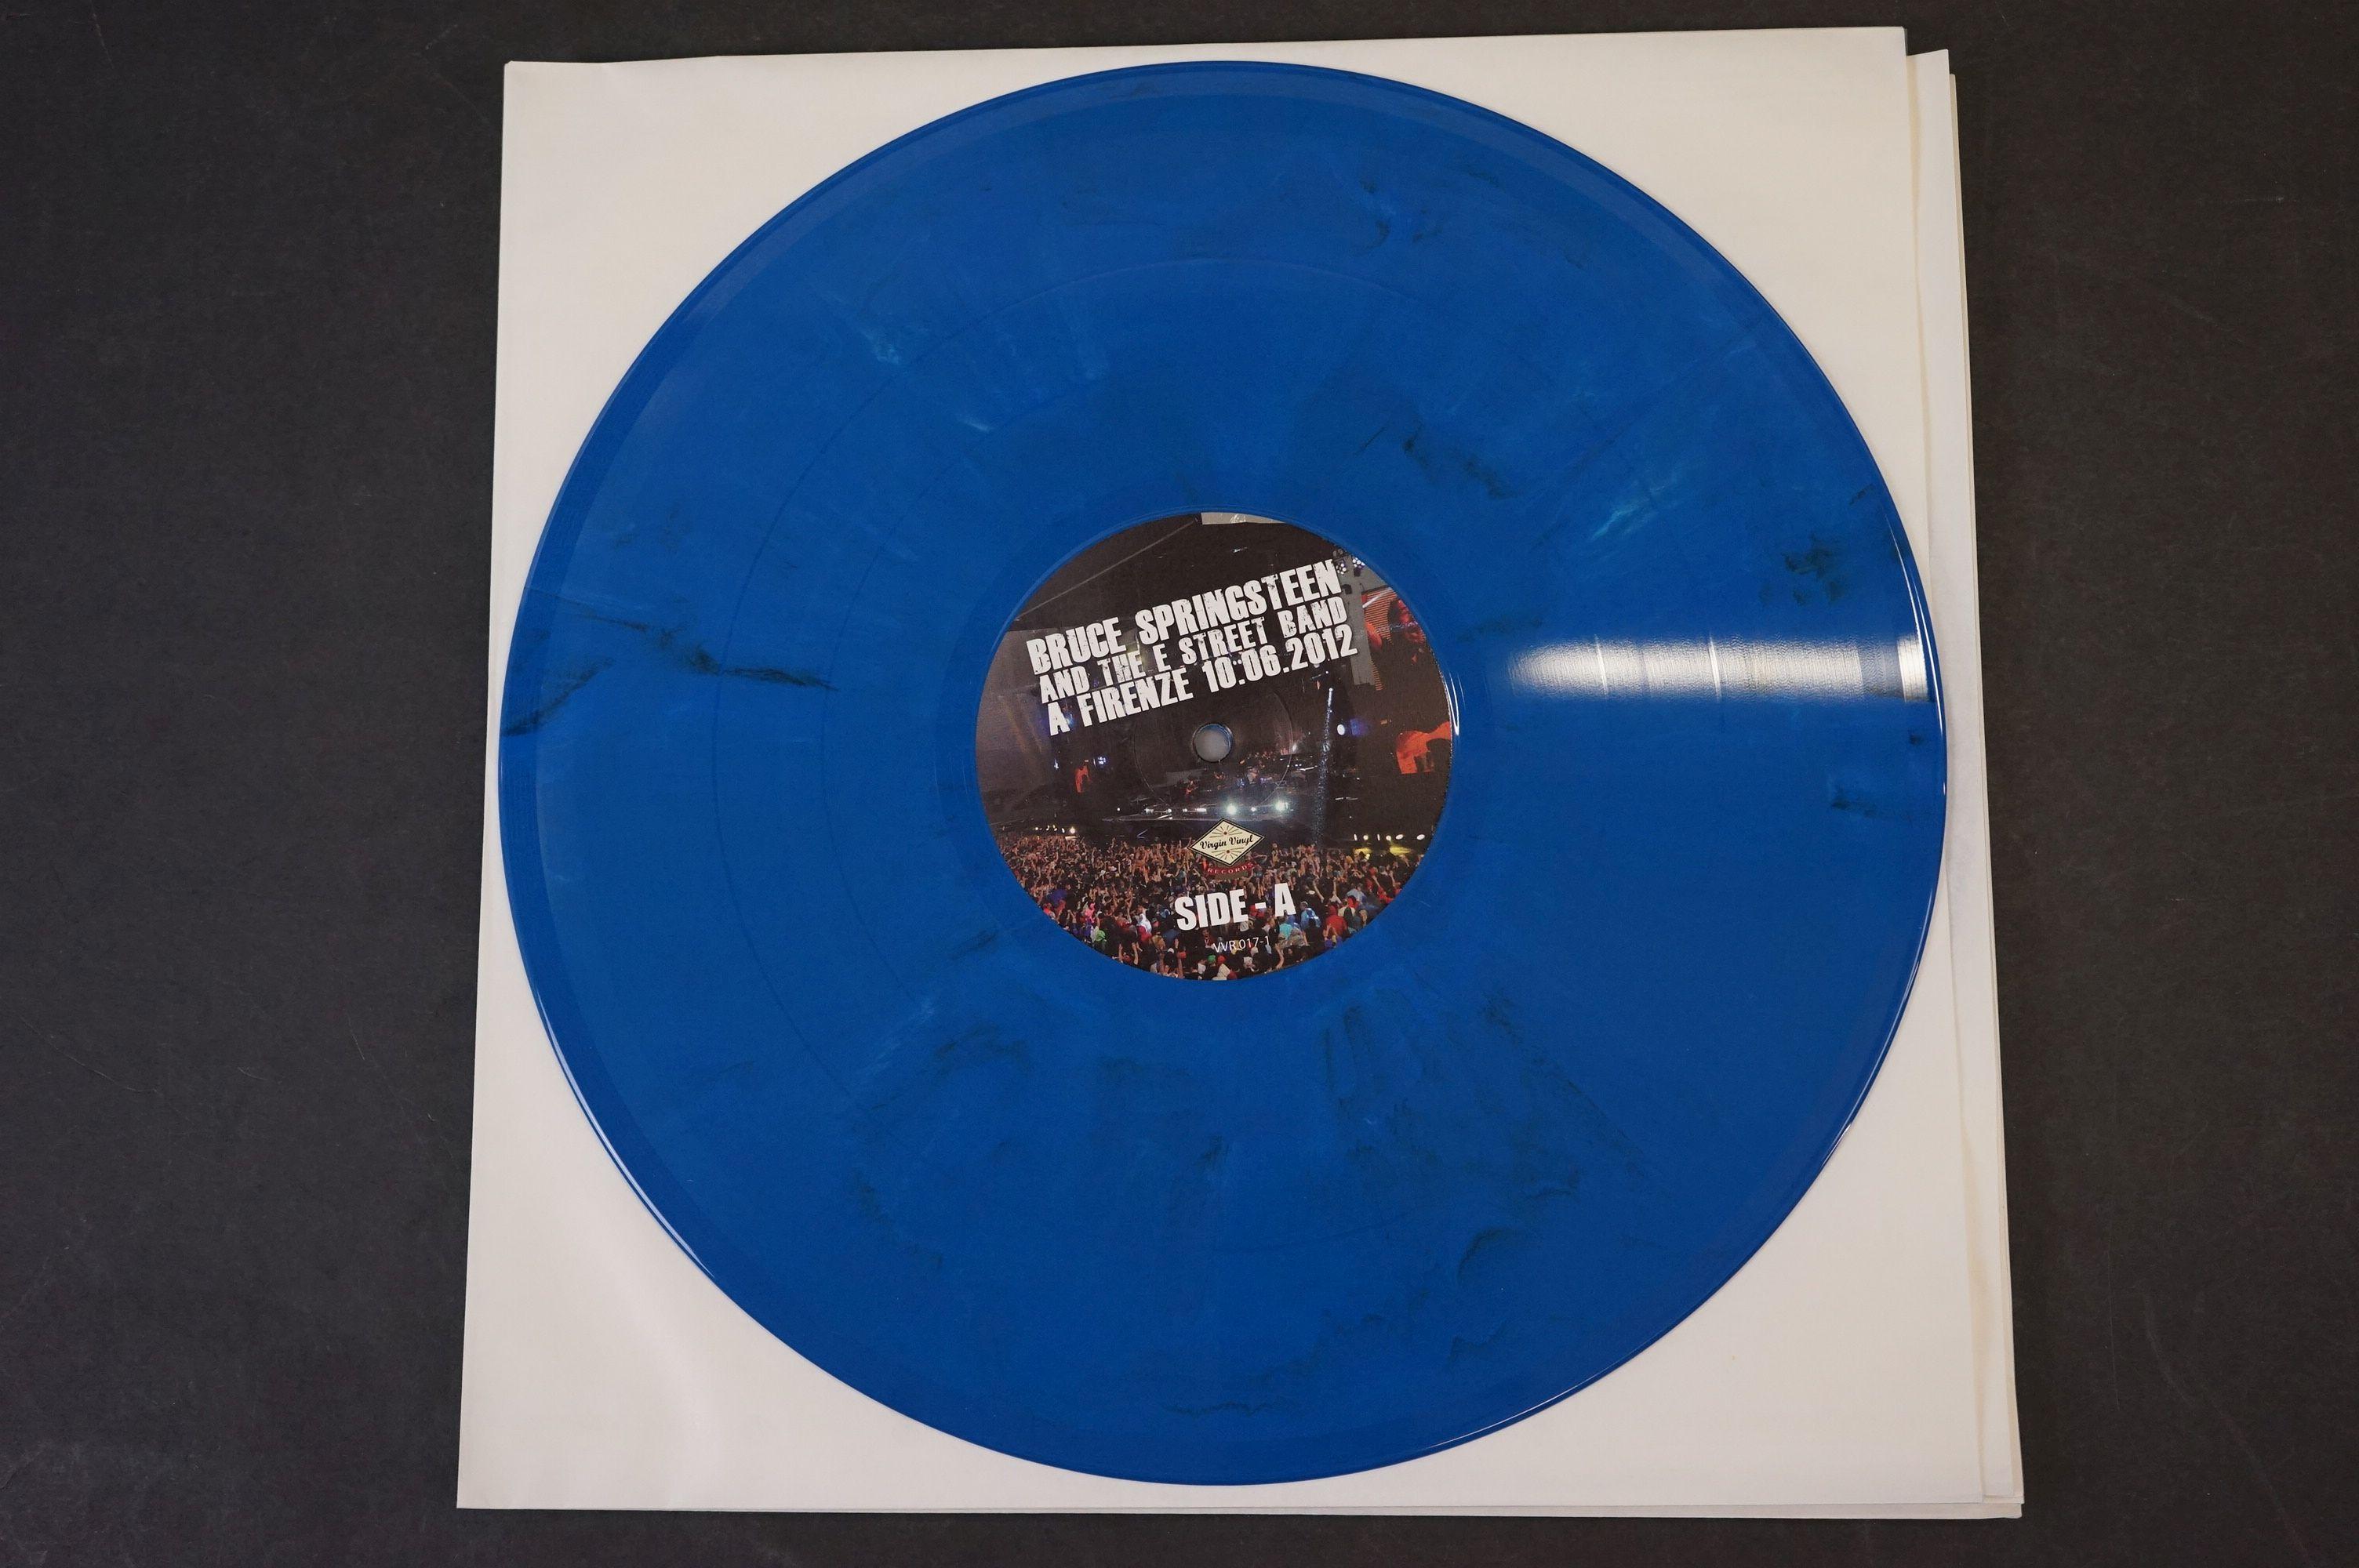 Vinyl - ltd edn Bruce Springsteen and The E Street Band A Firenze 10.06.2012 5 LP 3 CD 1 DVD heavy - Image 4 of 10